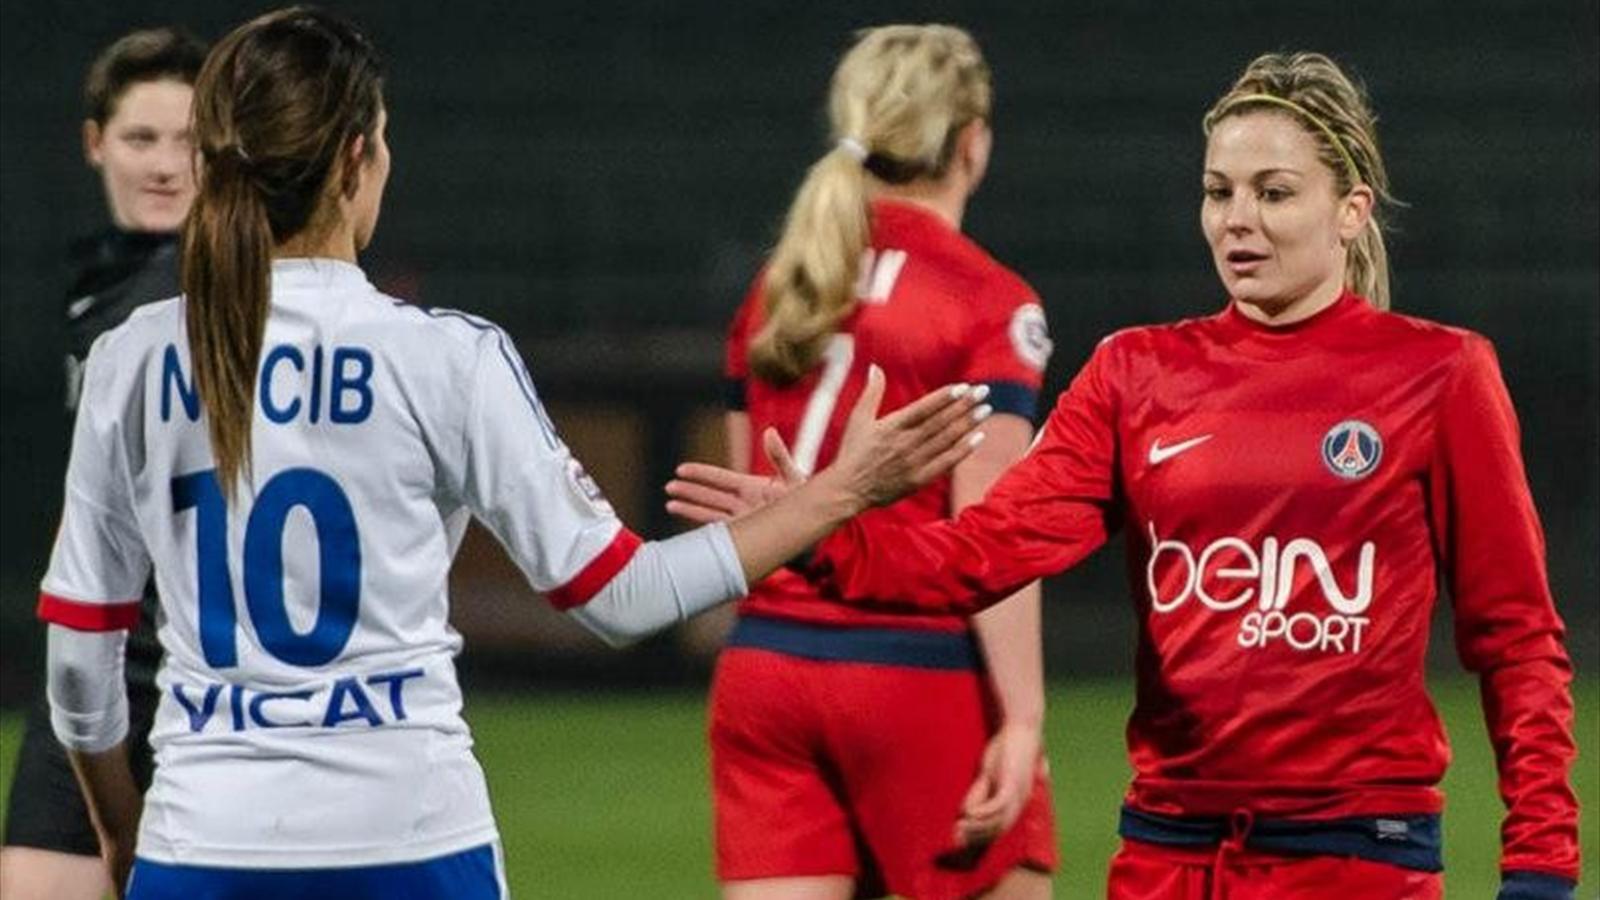 Le duel ol psg en chiffres football f minin 2013 football eurosport - Coupe europe foot feminin ...